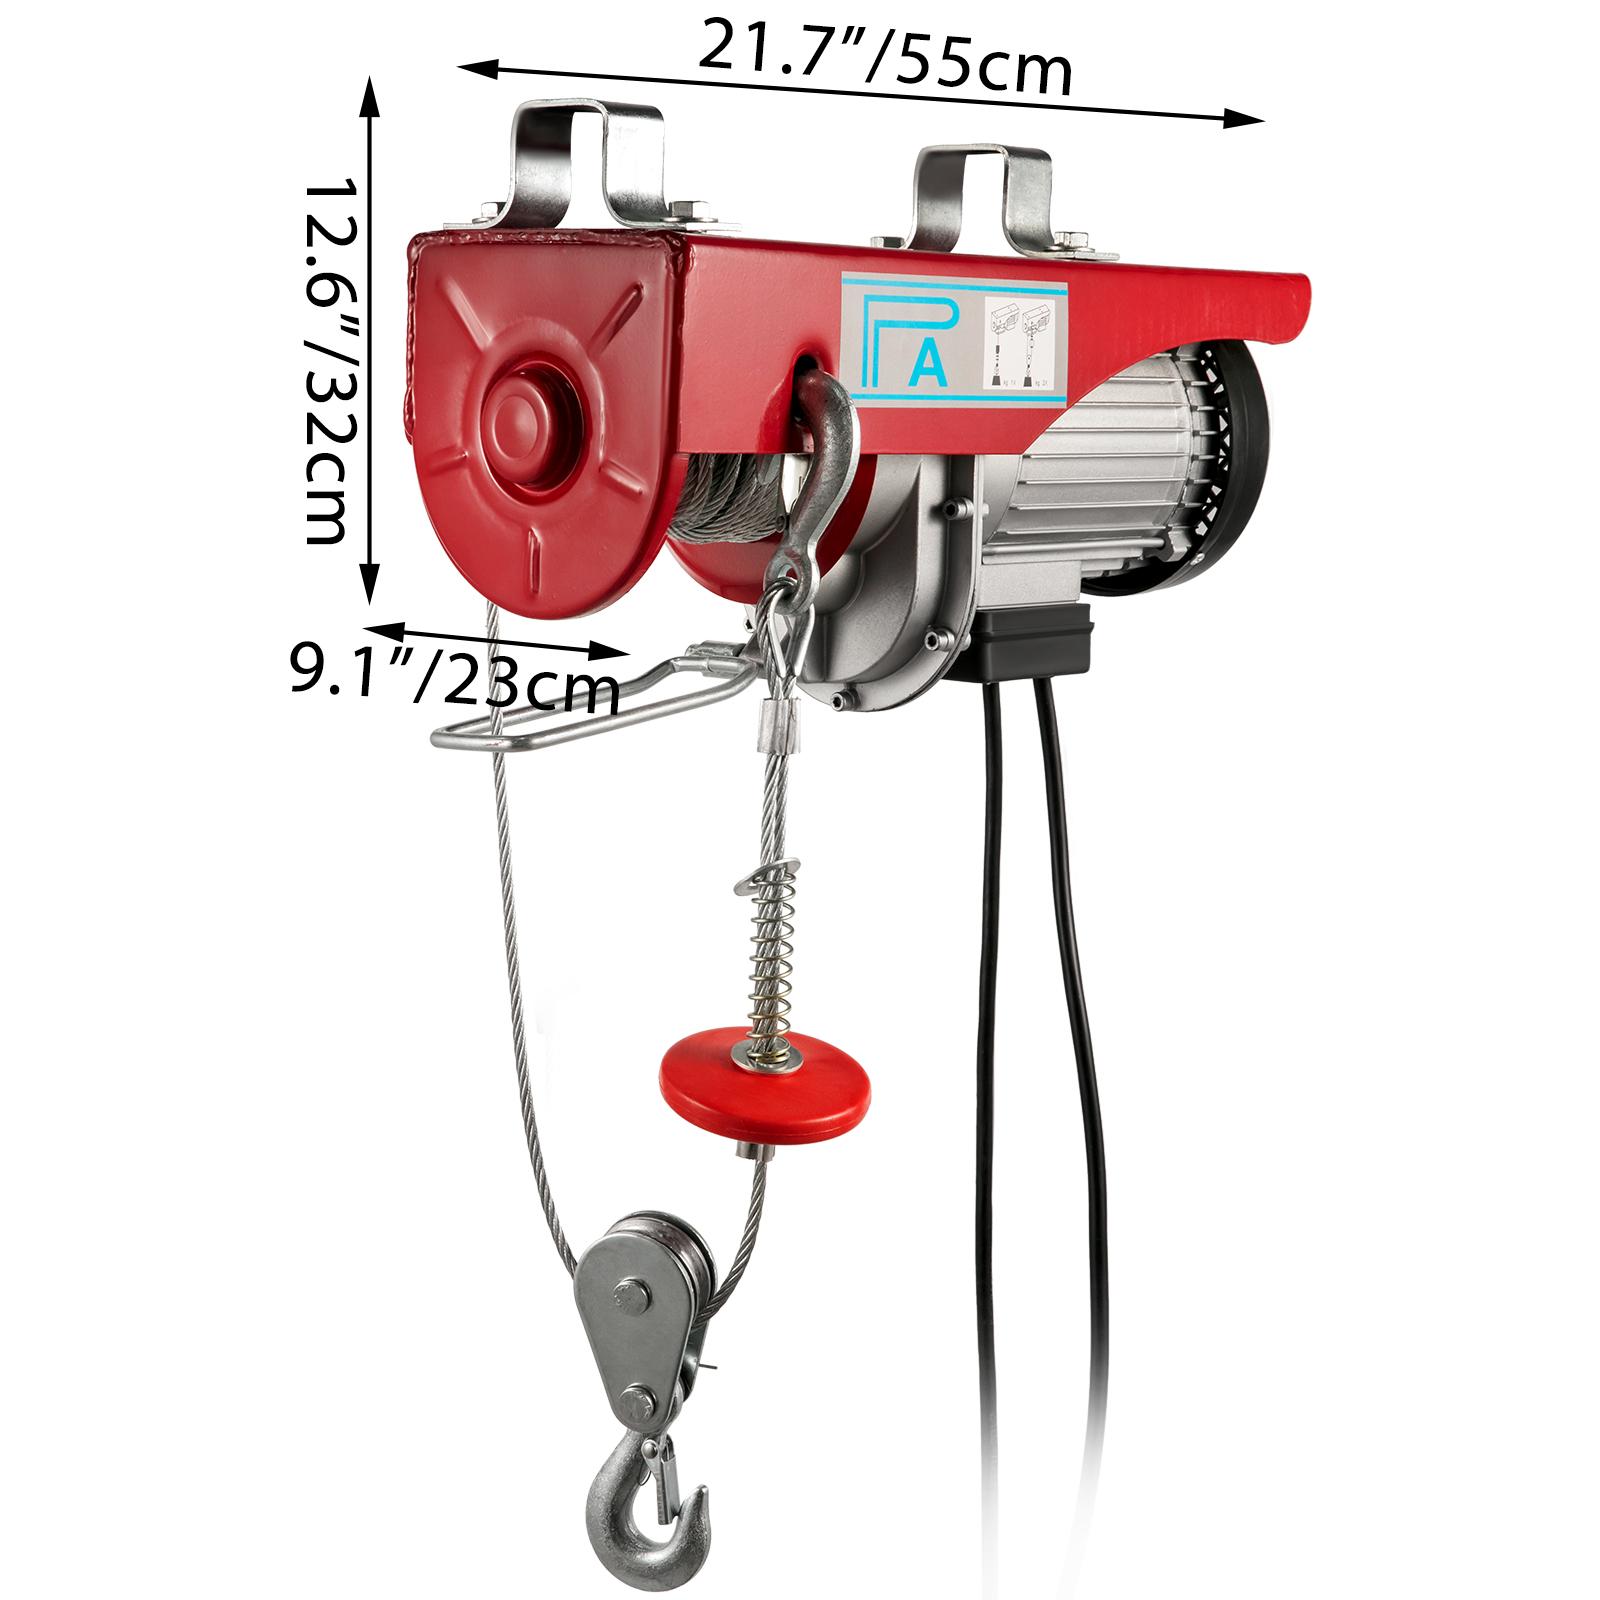 100kg-900kg-Electric-Hoist-Winch-Lifting-Engine-Crane-Cable-Lift-Hook-Garage miniature 80